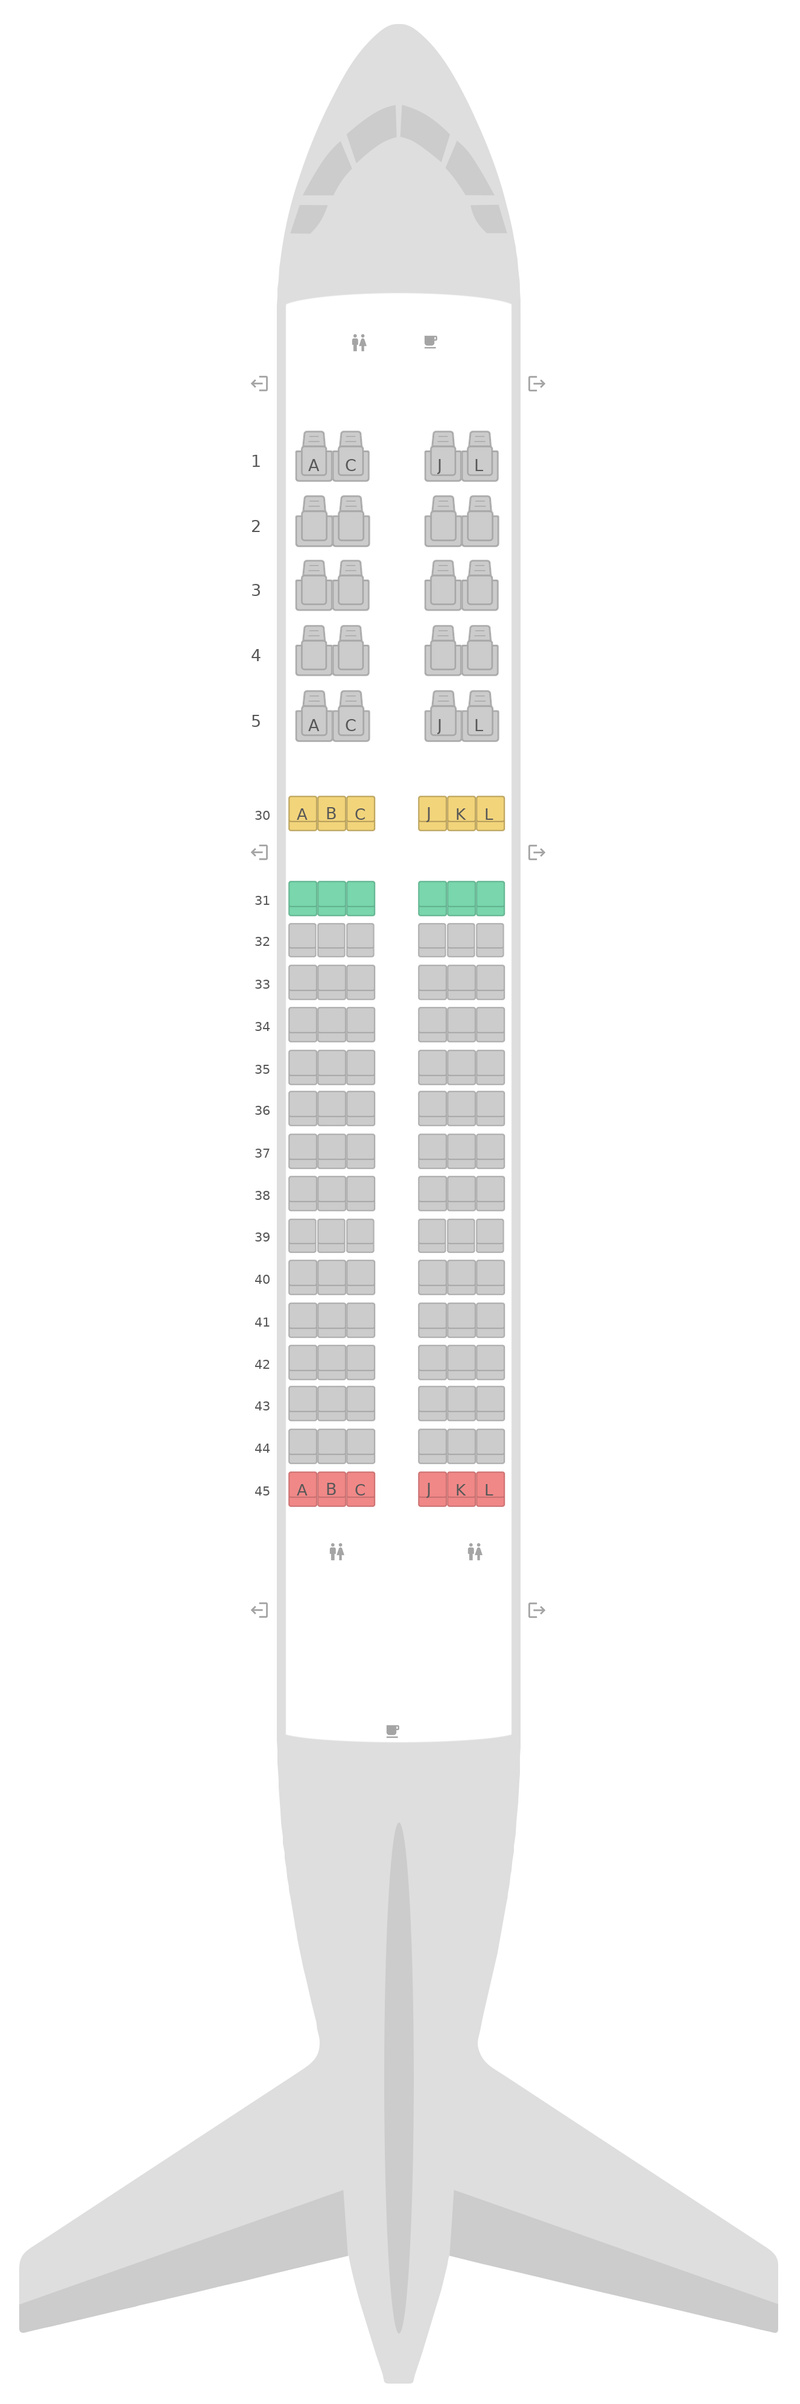 Mapa de asientos Airbus A320 v3 Saudi Arabian Airlines